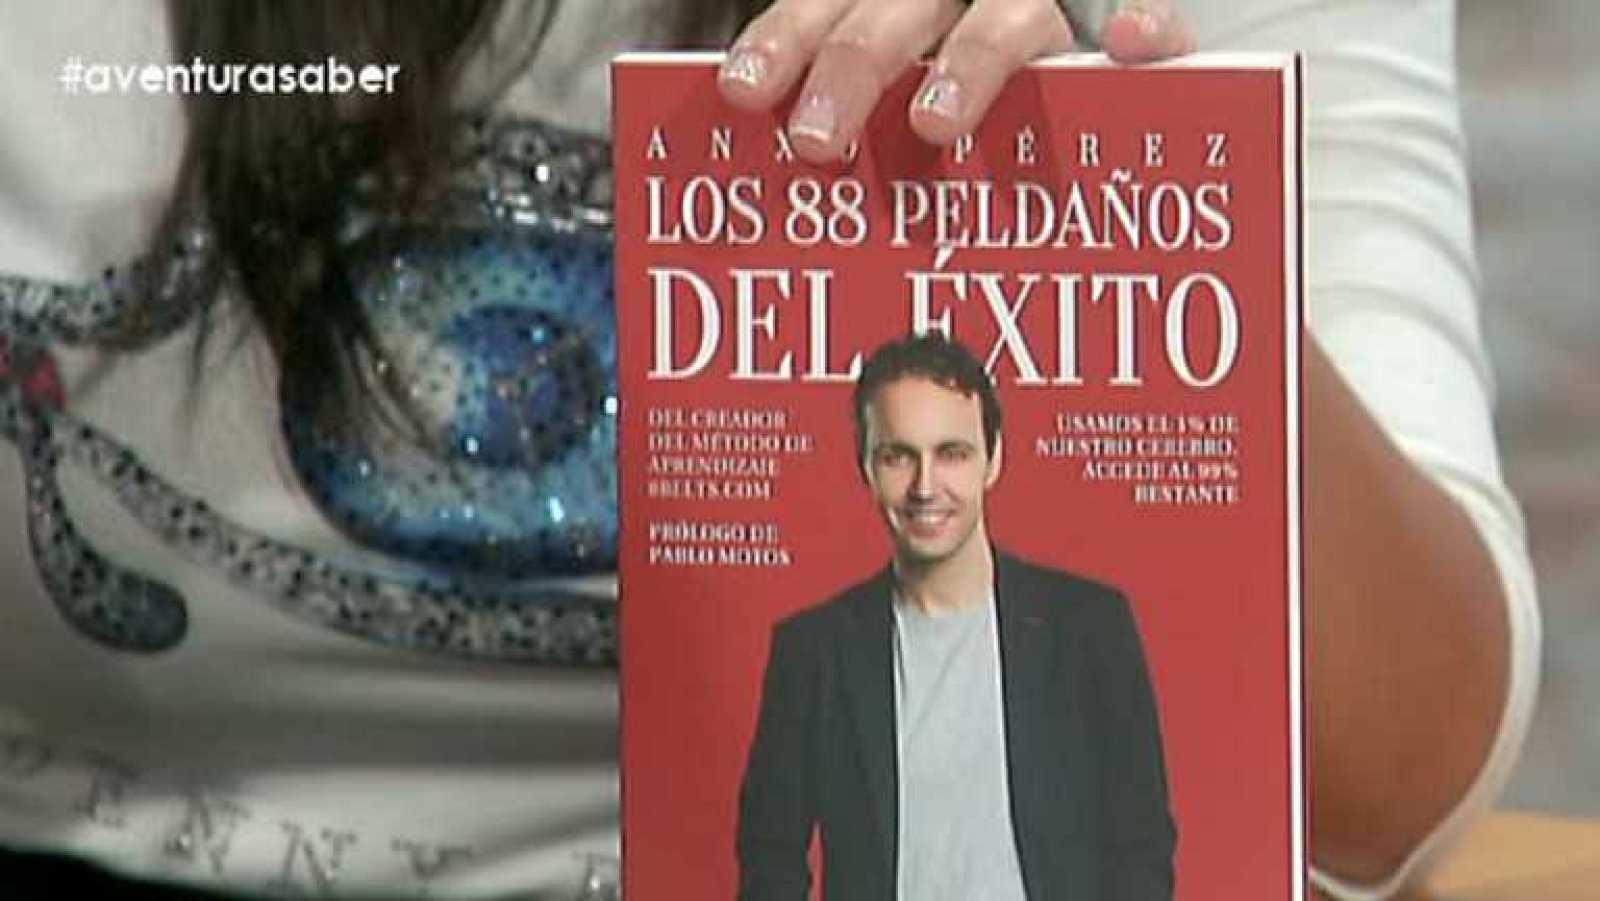 La aventura del saber - 14/10/14 - RTVE.es